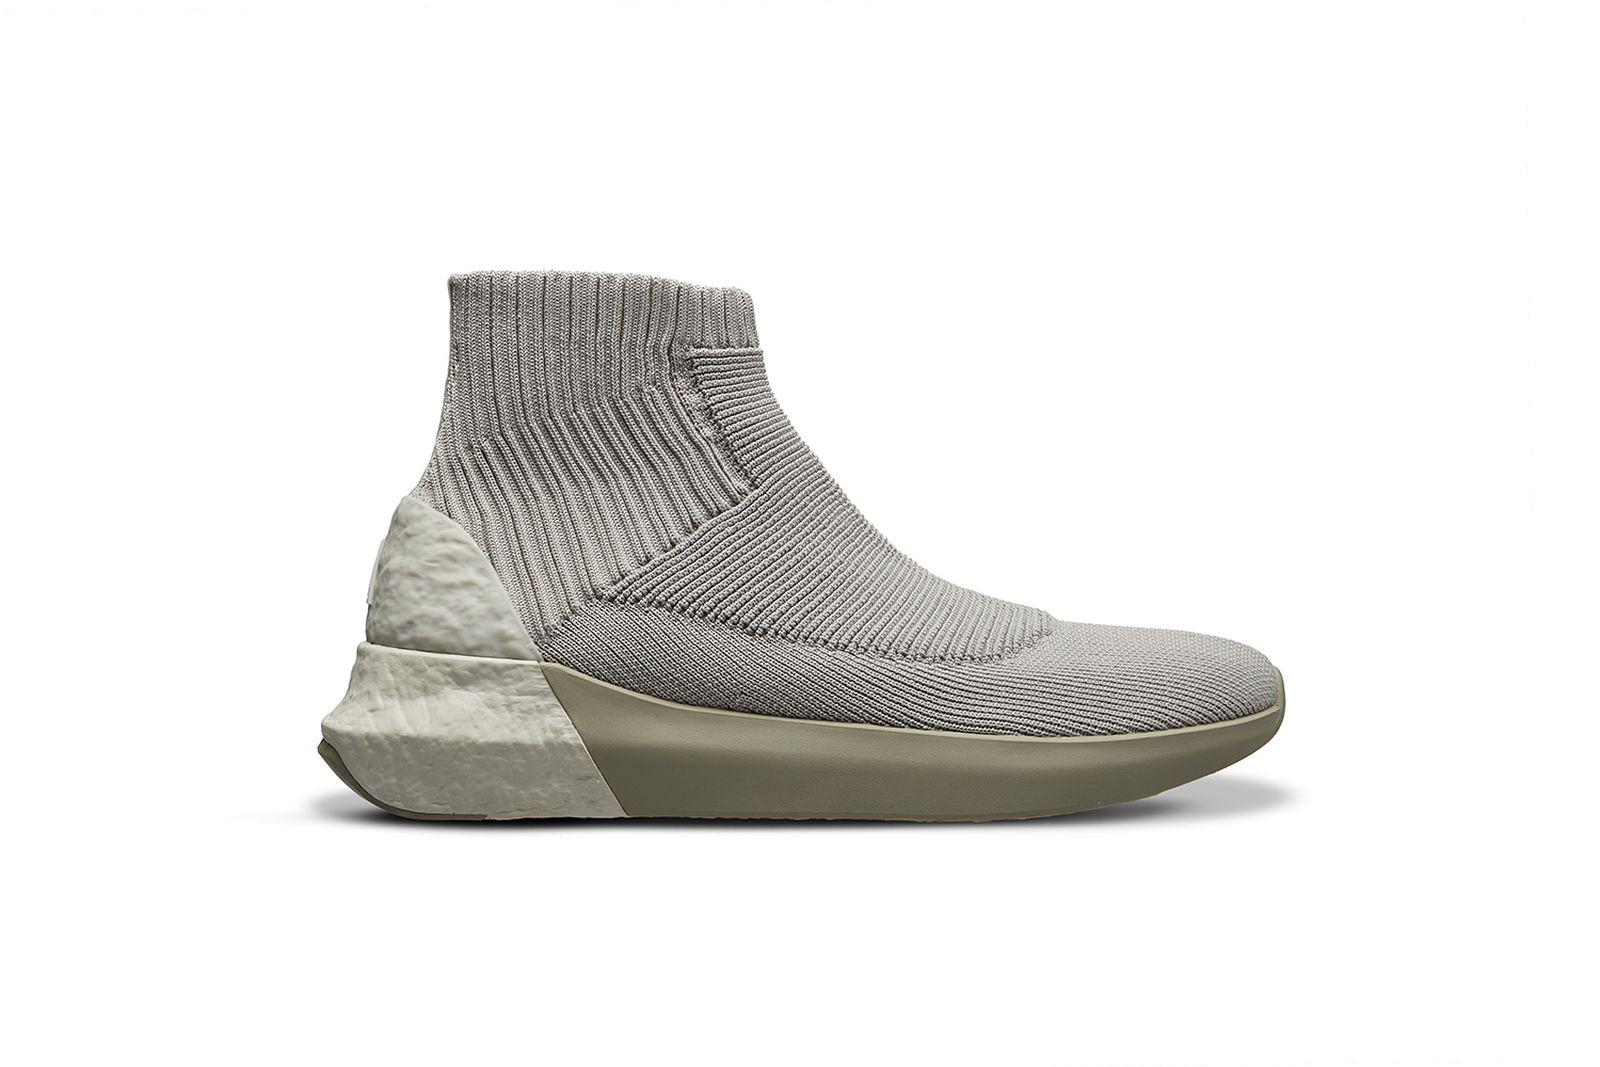 brandblack ss18 sock sneakers release date price info Brandblack Gama II Brandblack Harkoman